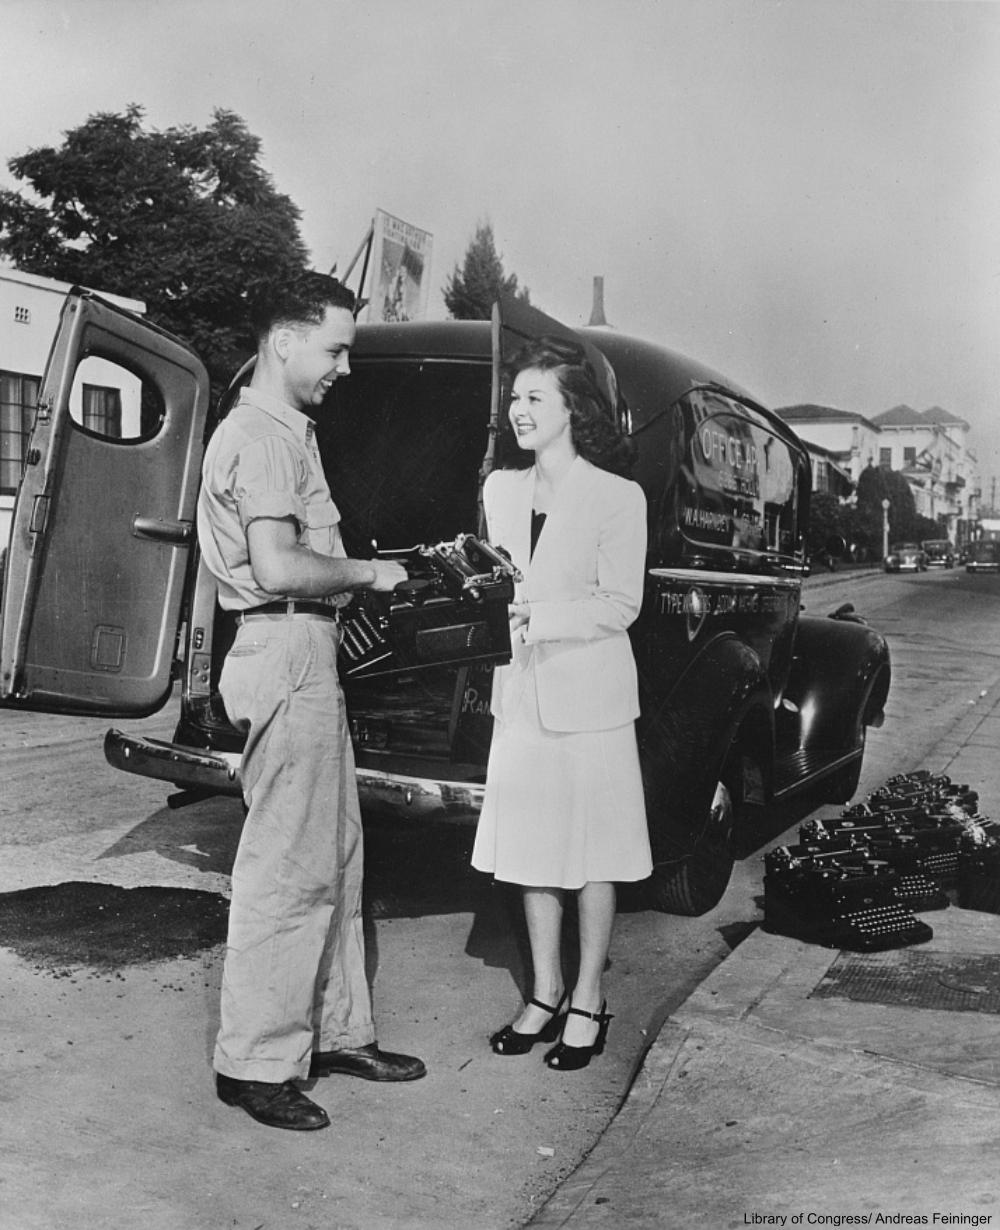 Susan Wayward Promoting the War Effort